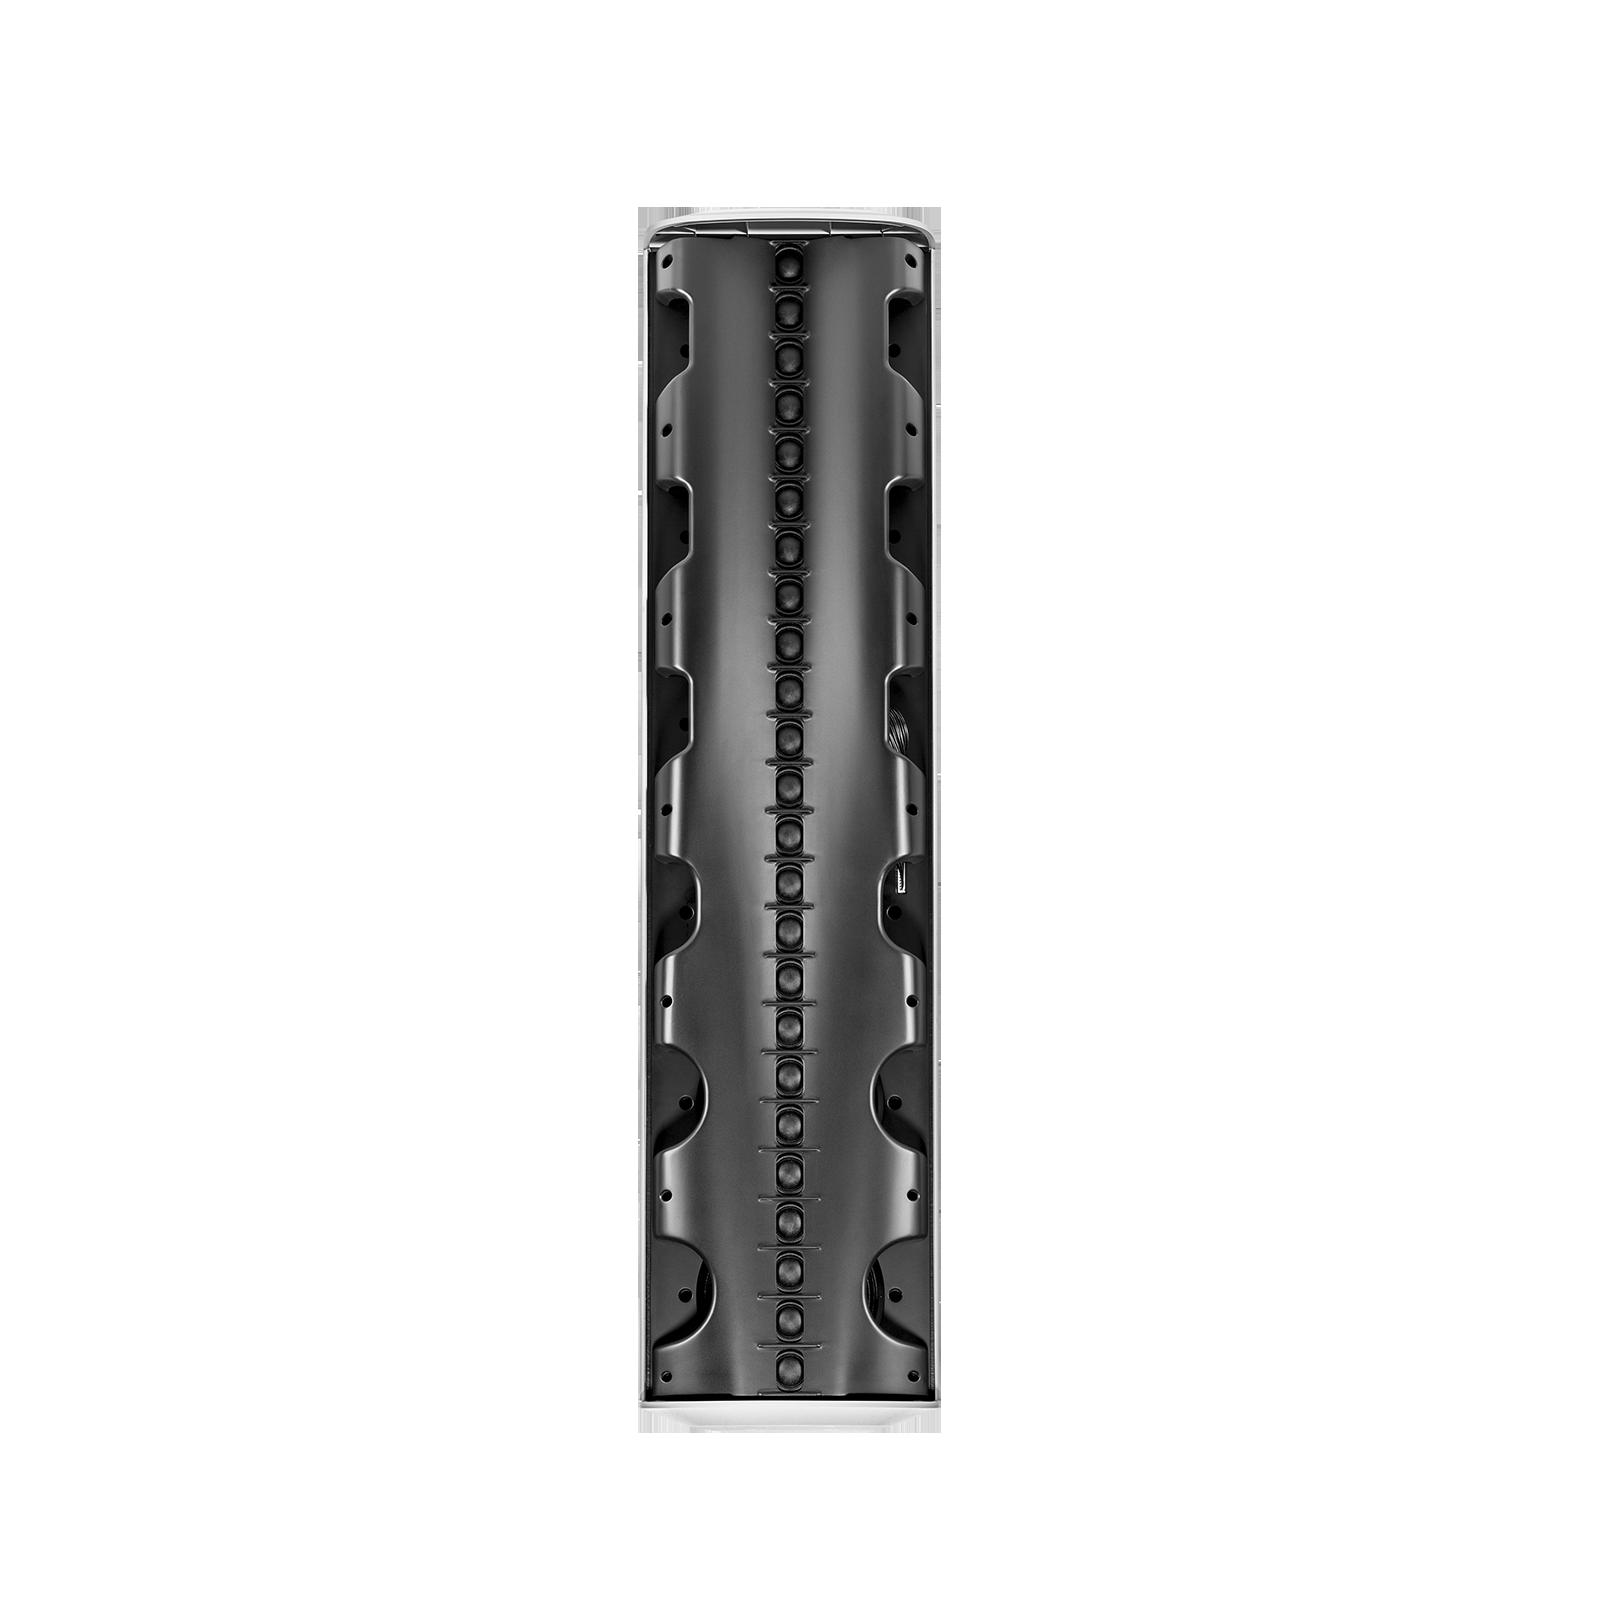 JBL CBT 1000 (B-Stock) - White - Constant Beamwidth Technology ™ Adjustable Coverage Line Array Column - Detailshot 1